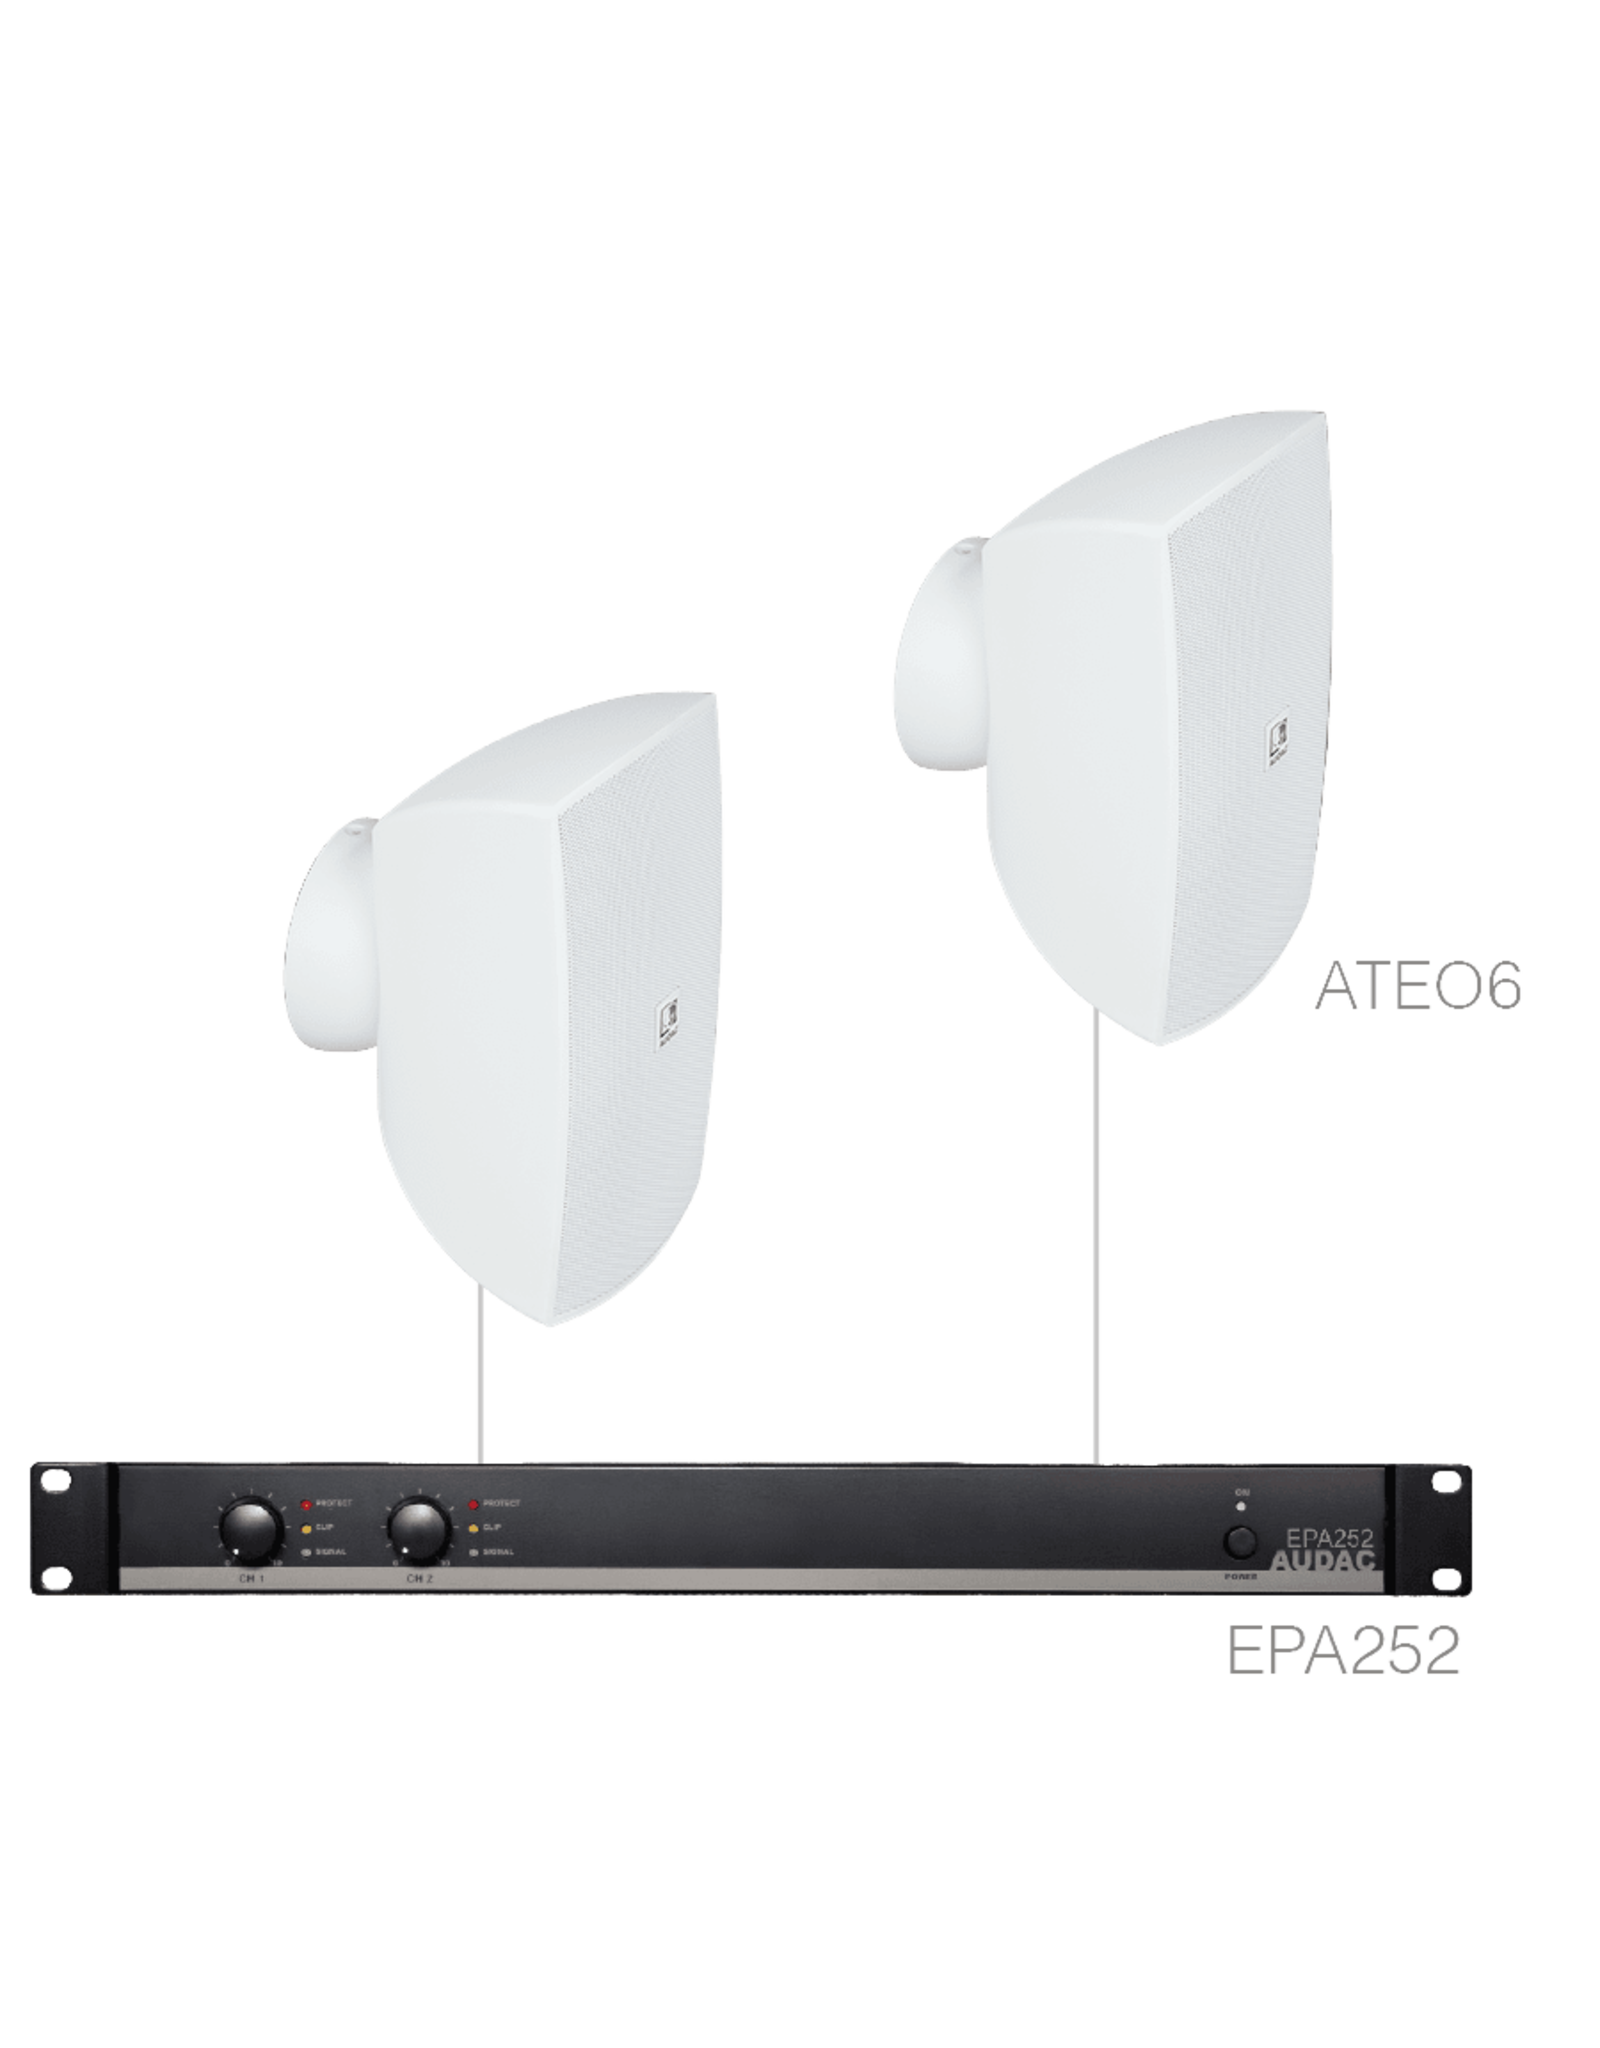 Audac 2 x ATEO6 + EPA252 White